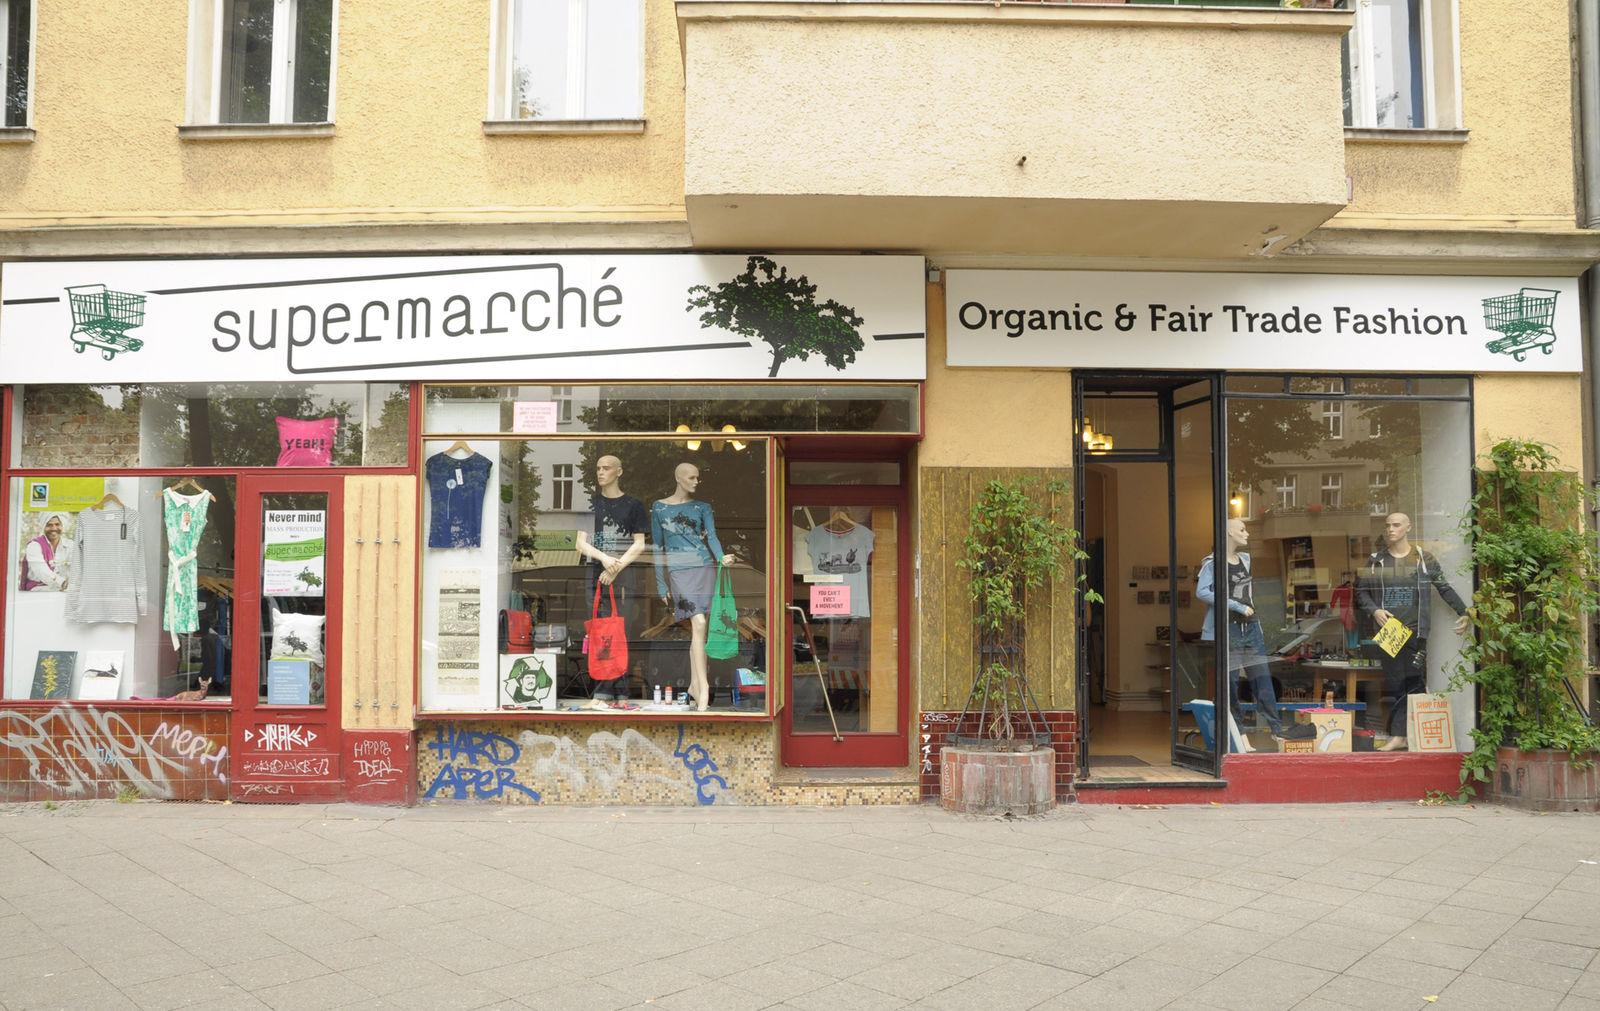 supermarch organic fair trade fashion green fair trade fashion in berlin wiener stra e. Black Bedroom Furniture Sets. Home Design Ideas